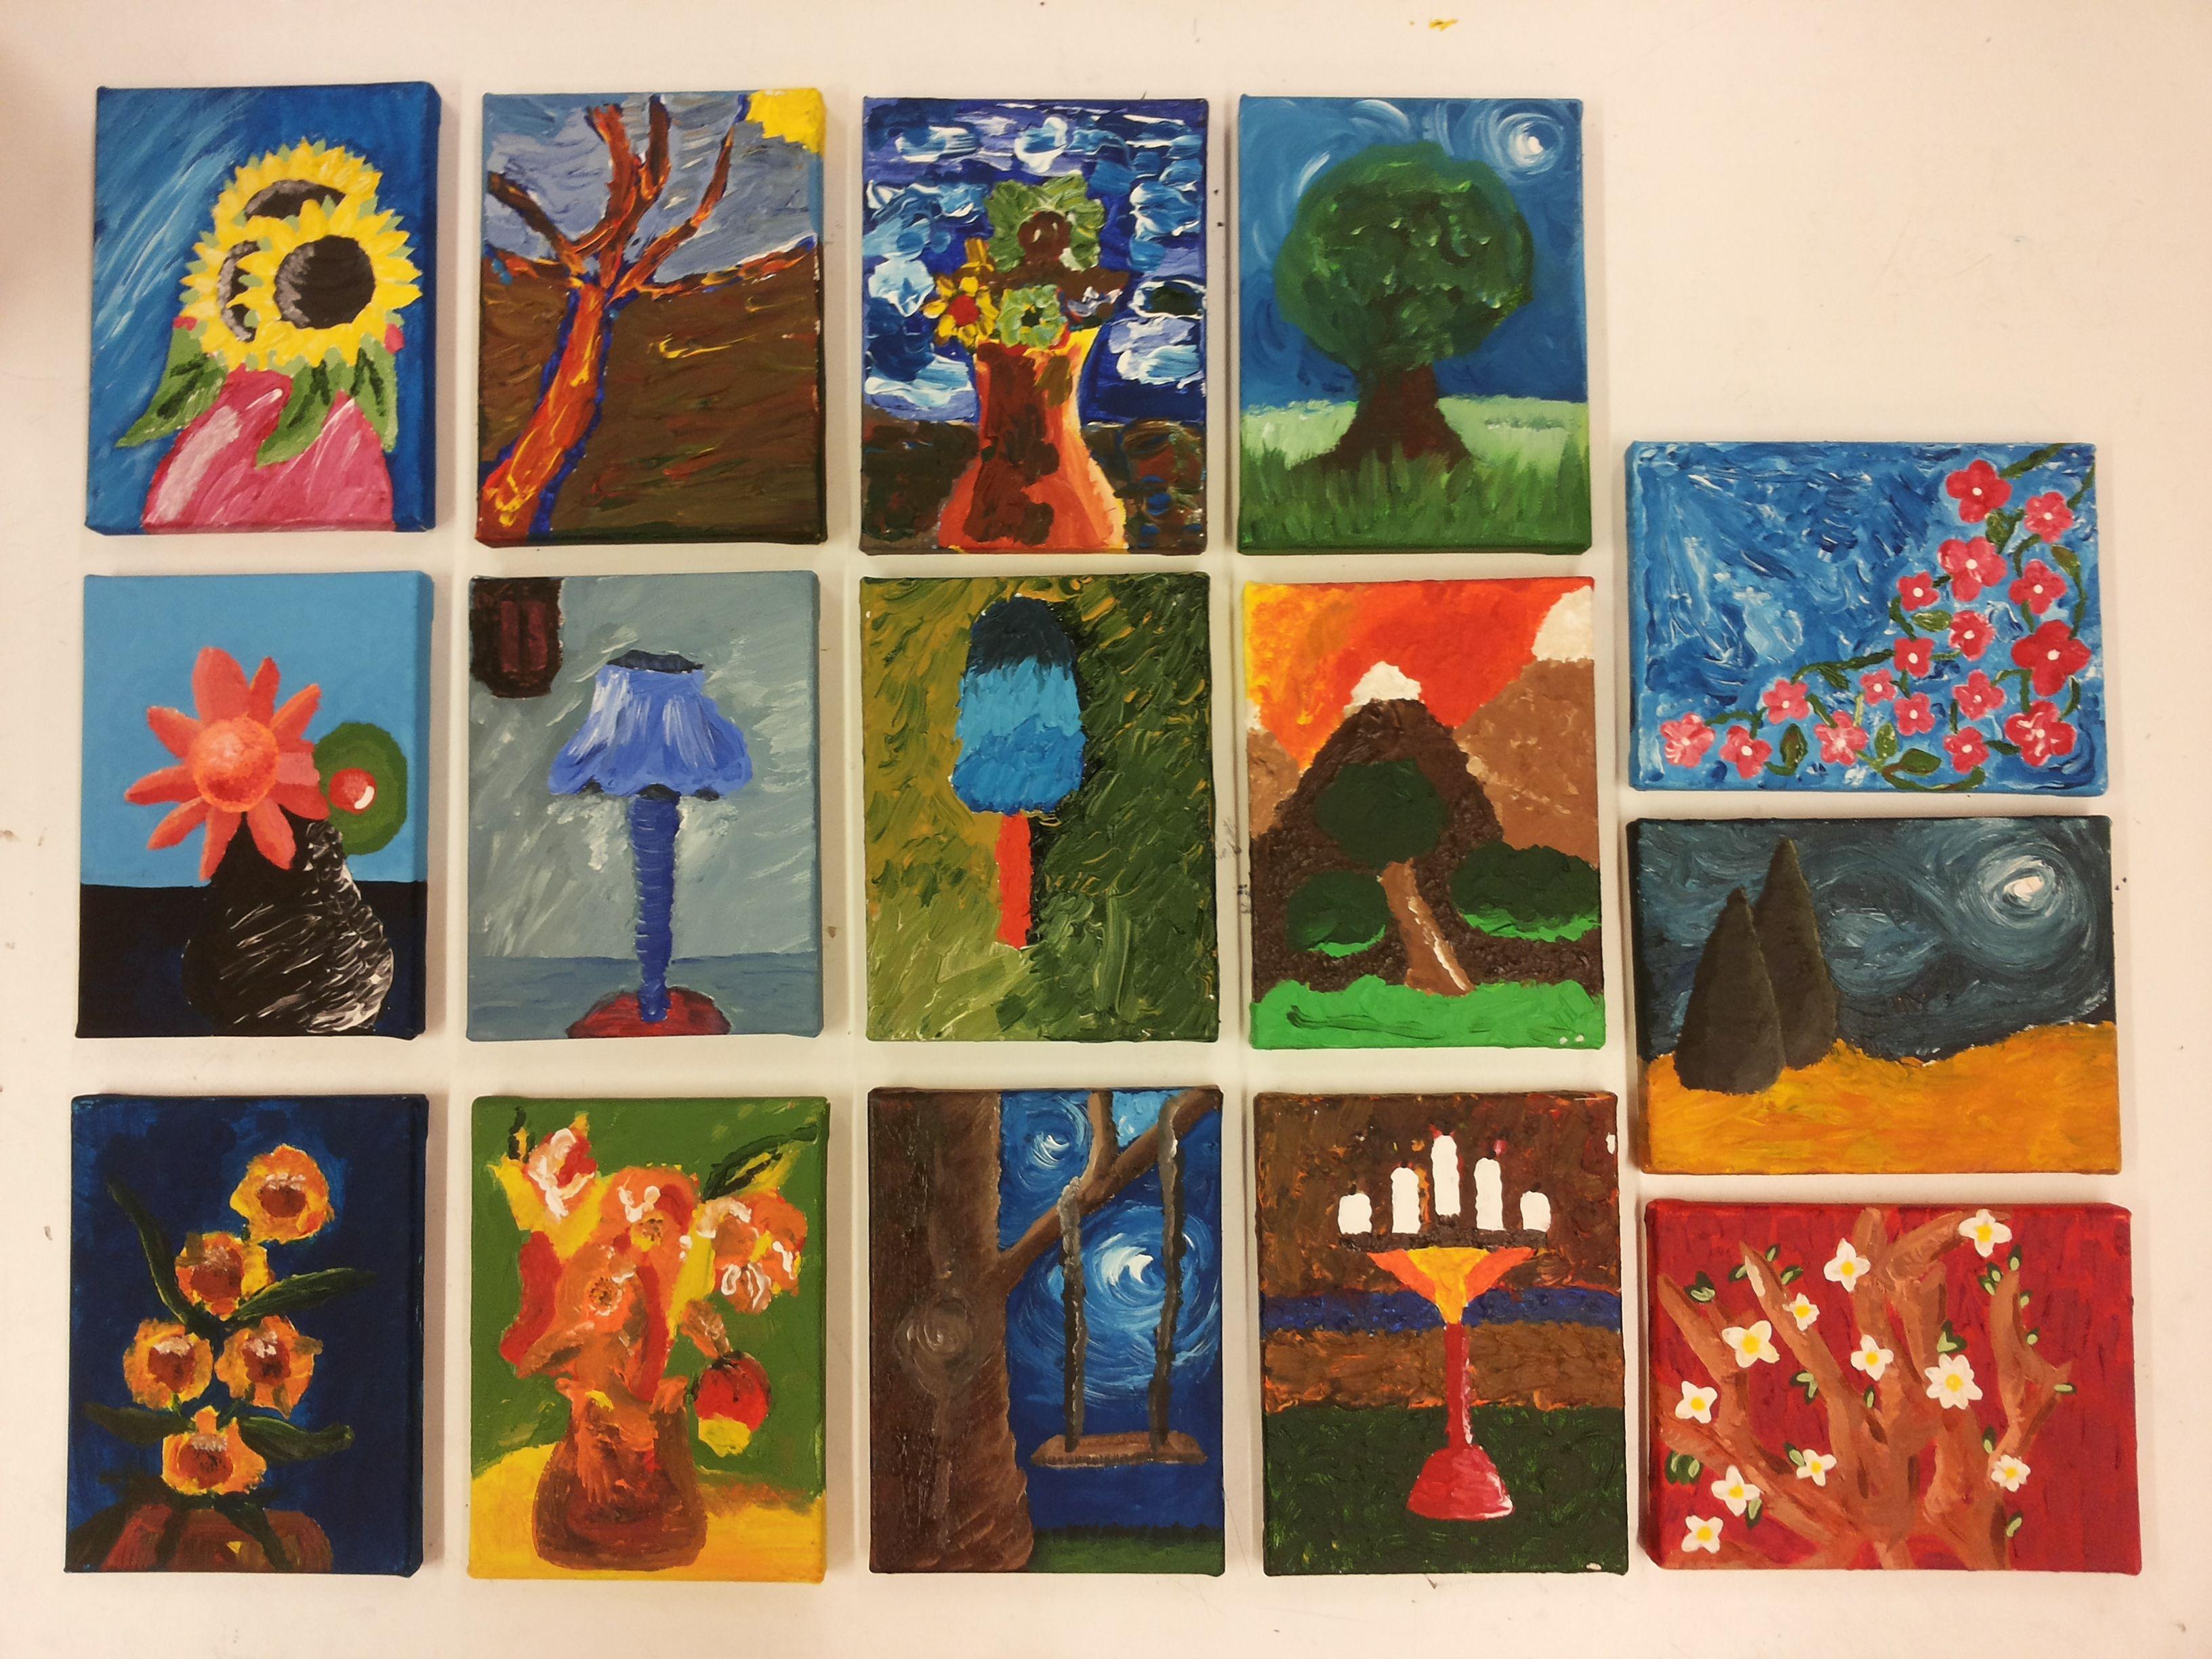 Pasteus schilderen klas showcase zonegge